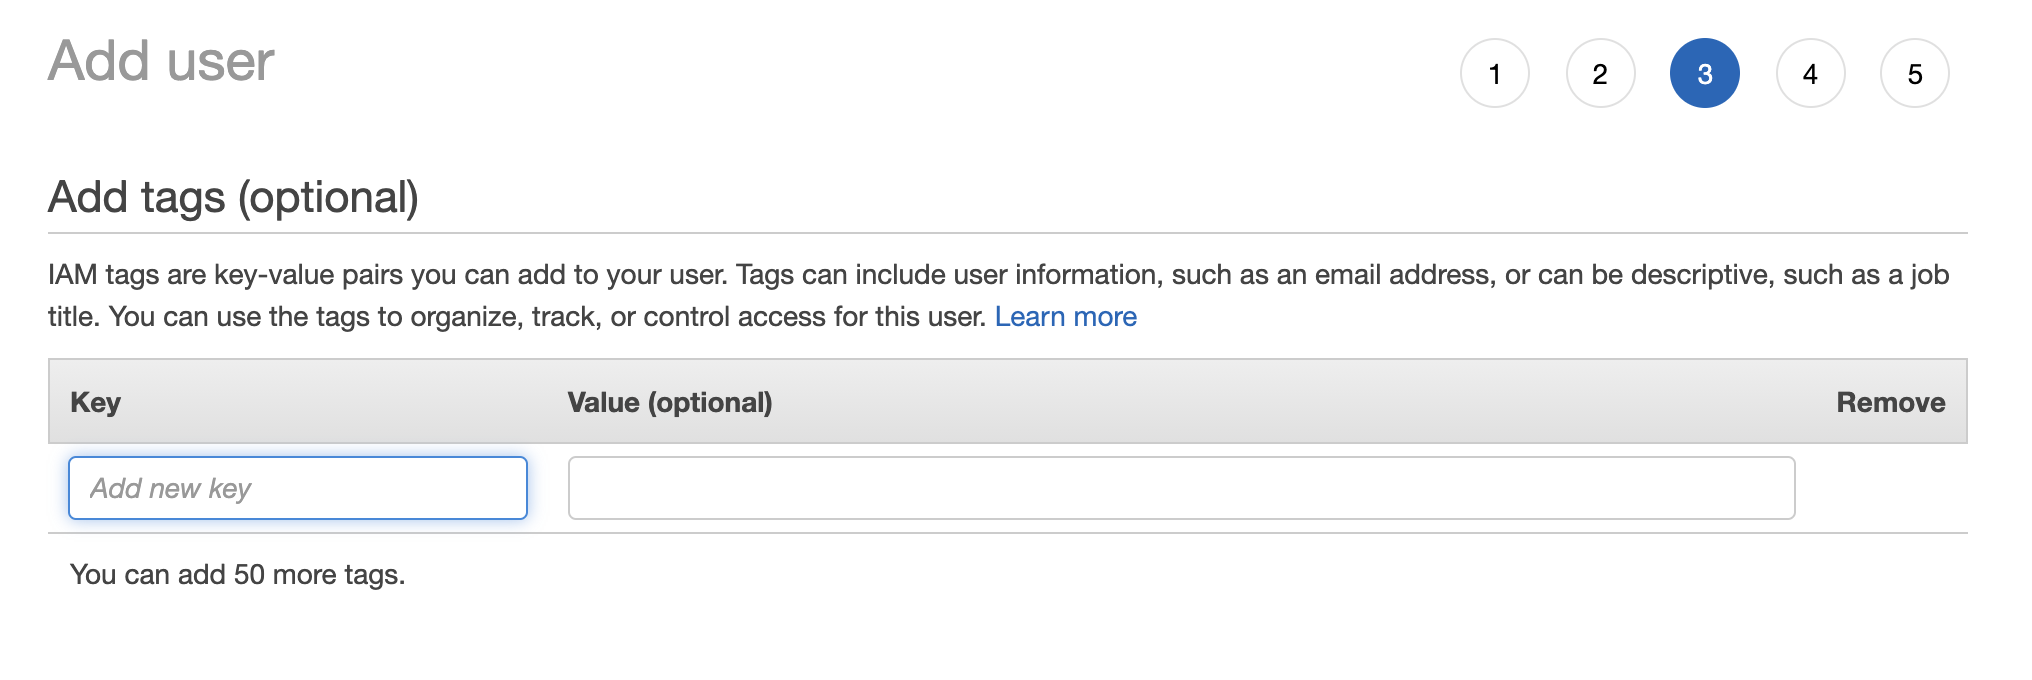 Step 3—Add tags (optional)